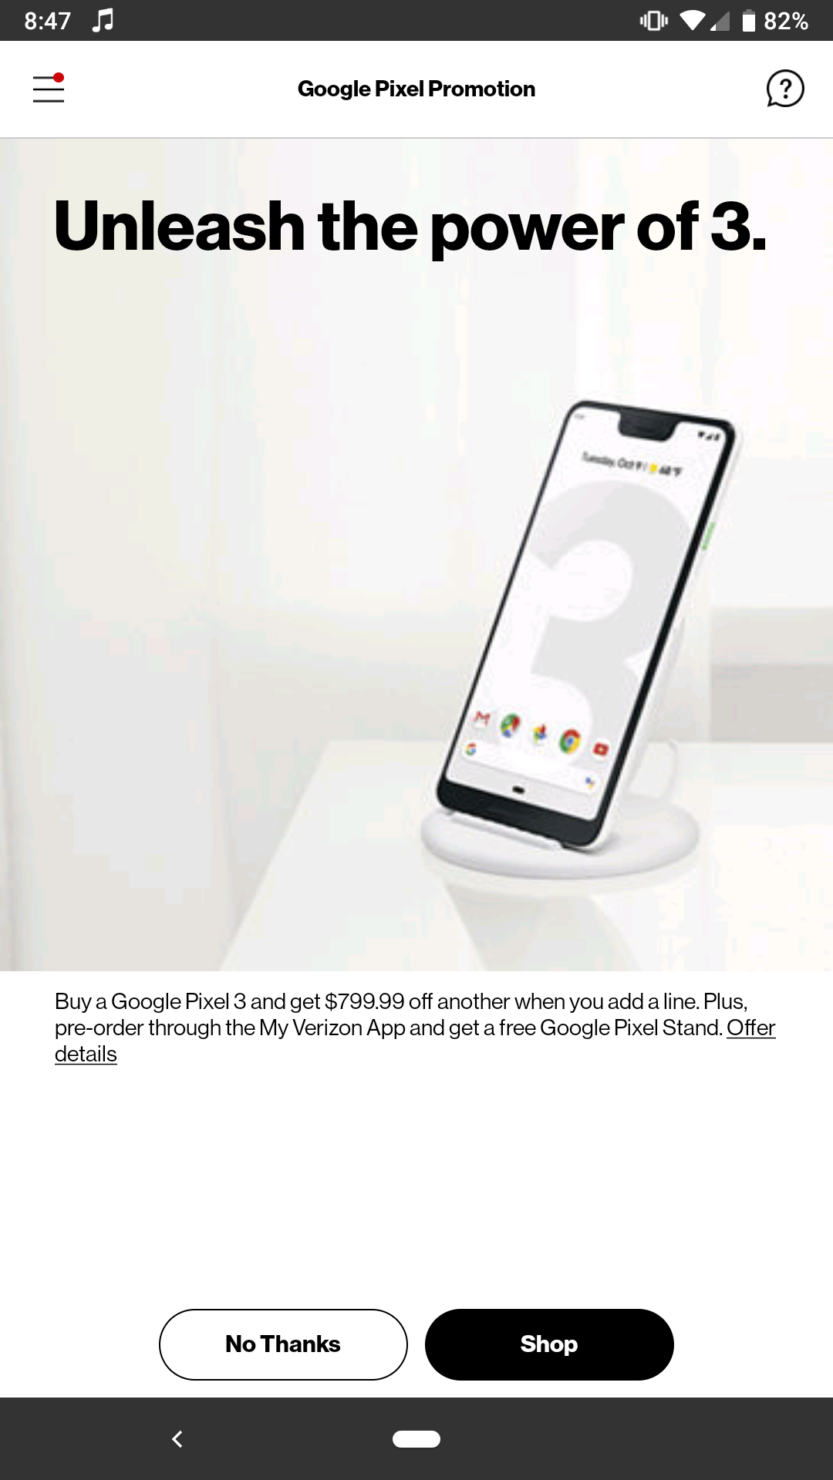 Google Pixel 3 Pricing From Verizon